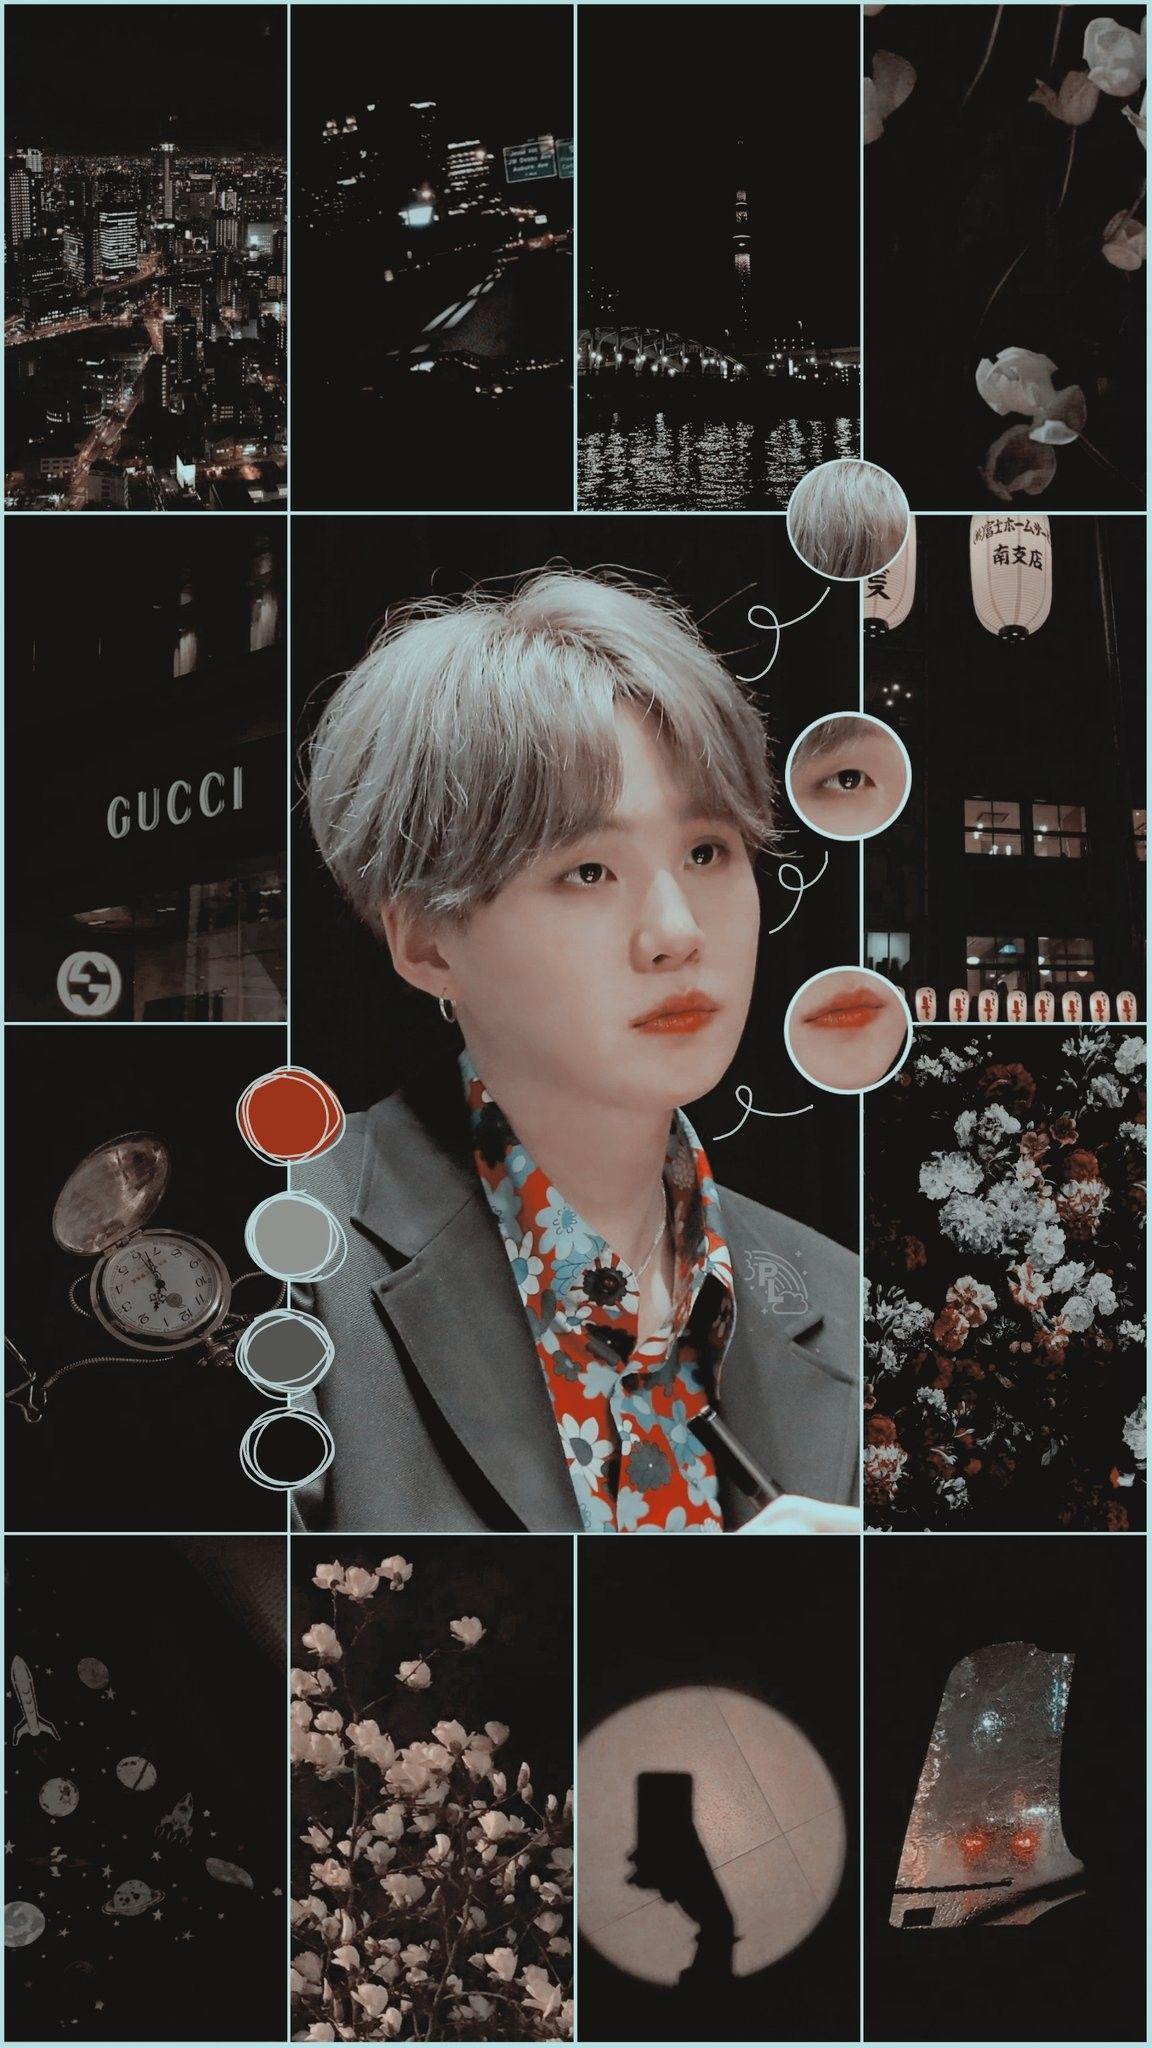 Yoongi Aesthetic Wallpaper Credits To Twitter Padicklocksz C Yoongi Suga Bts Wallpaper Bts Polaroid Suga